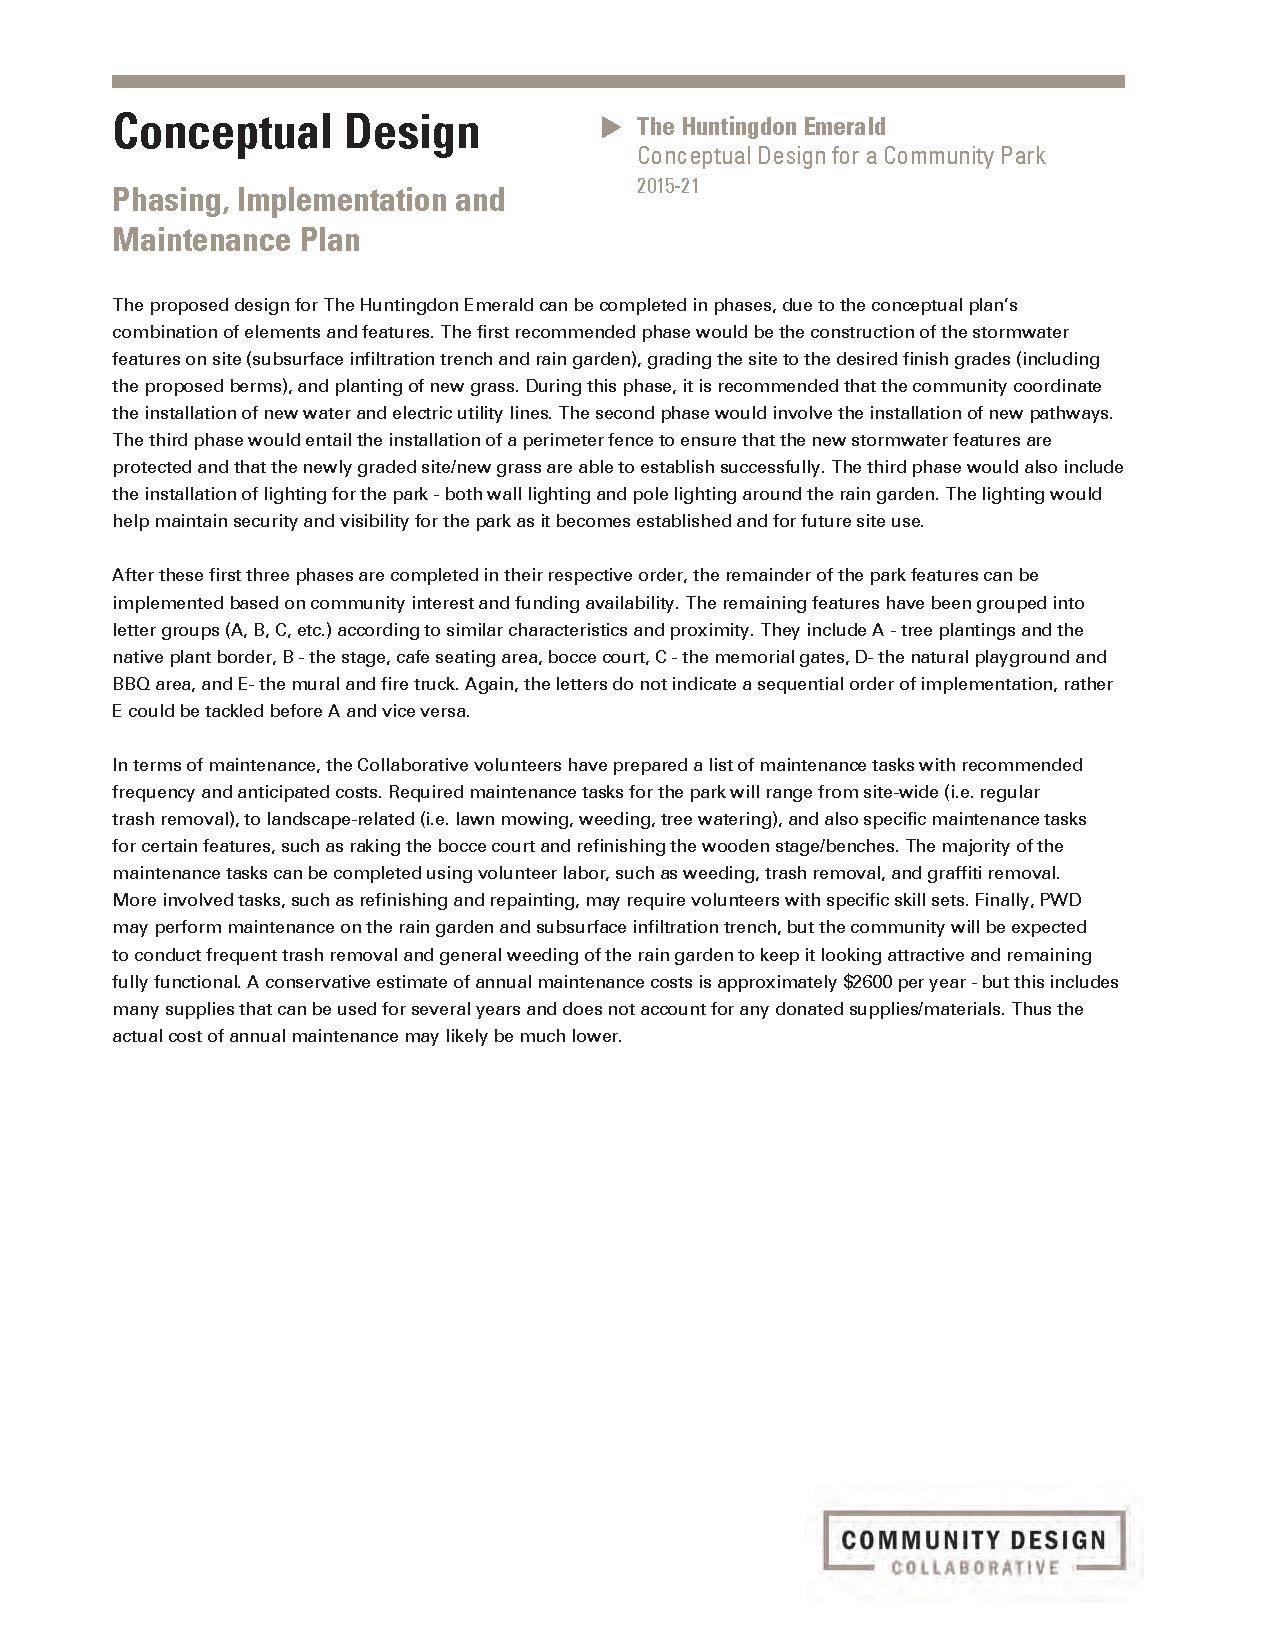 Huntingdon Emerald Design 41-85 COPY_Page_6.jpg